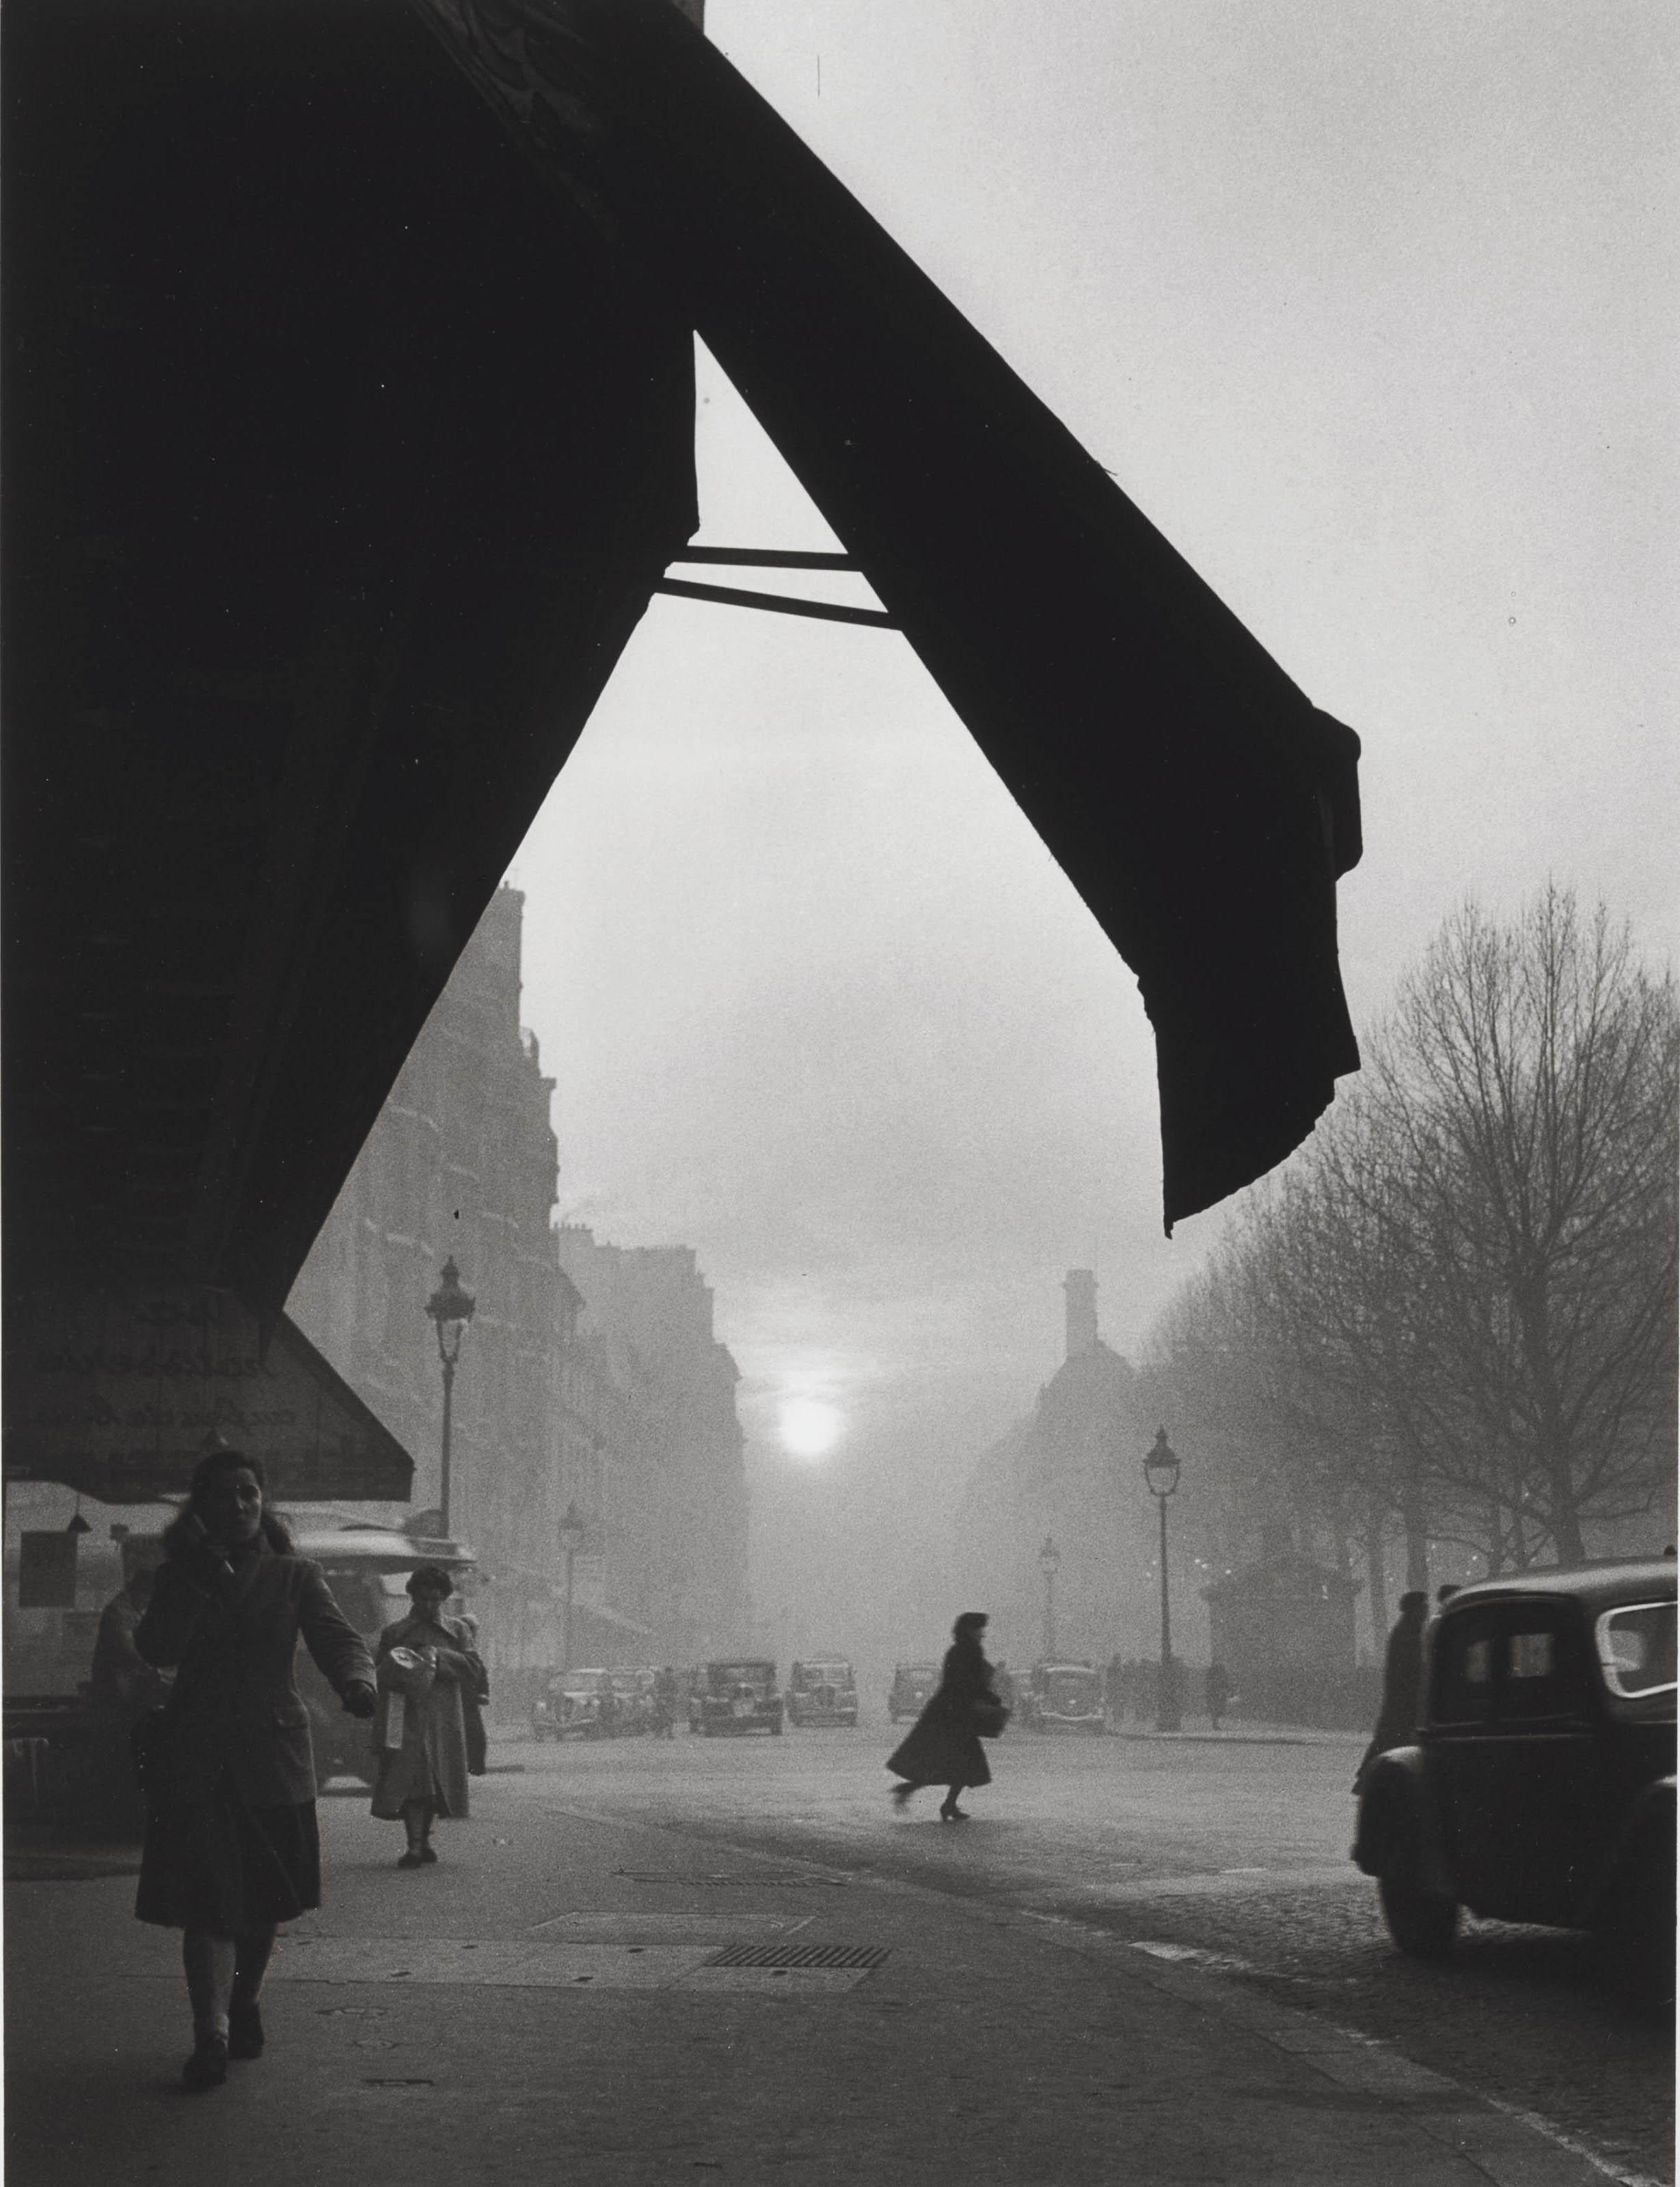 Carrefour, Sèvres-Babylone, 1948